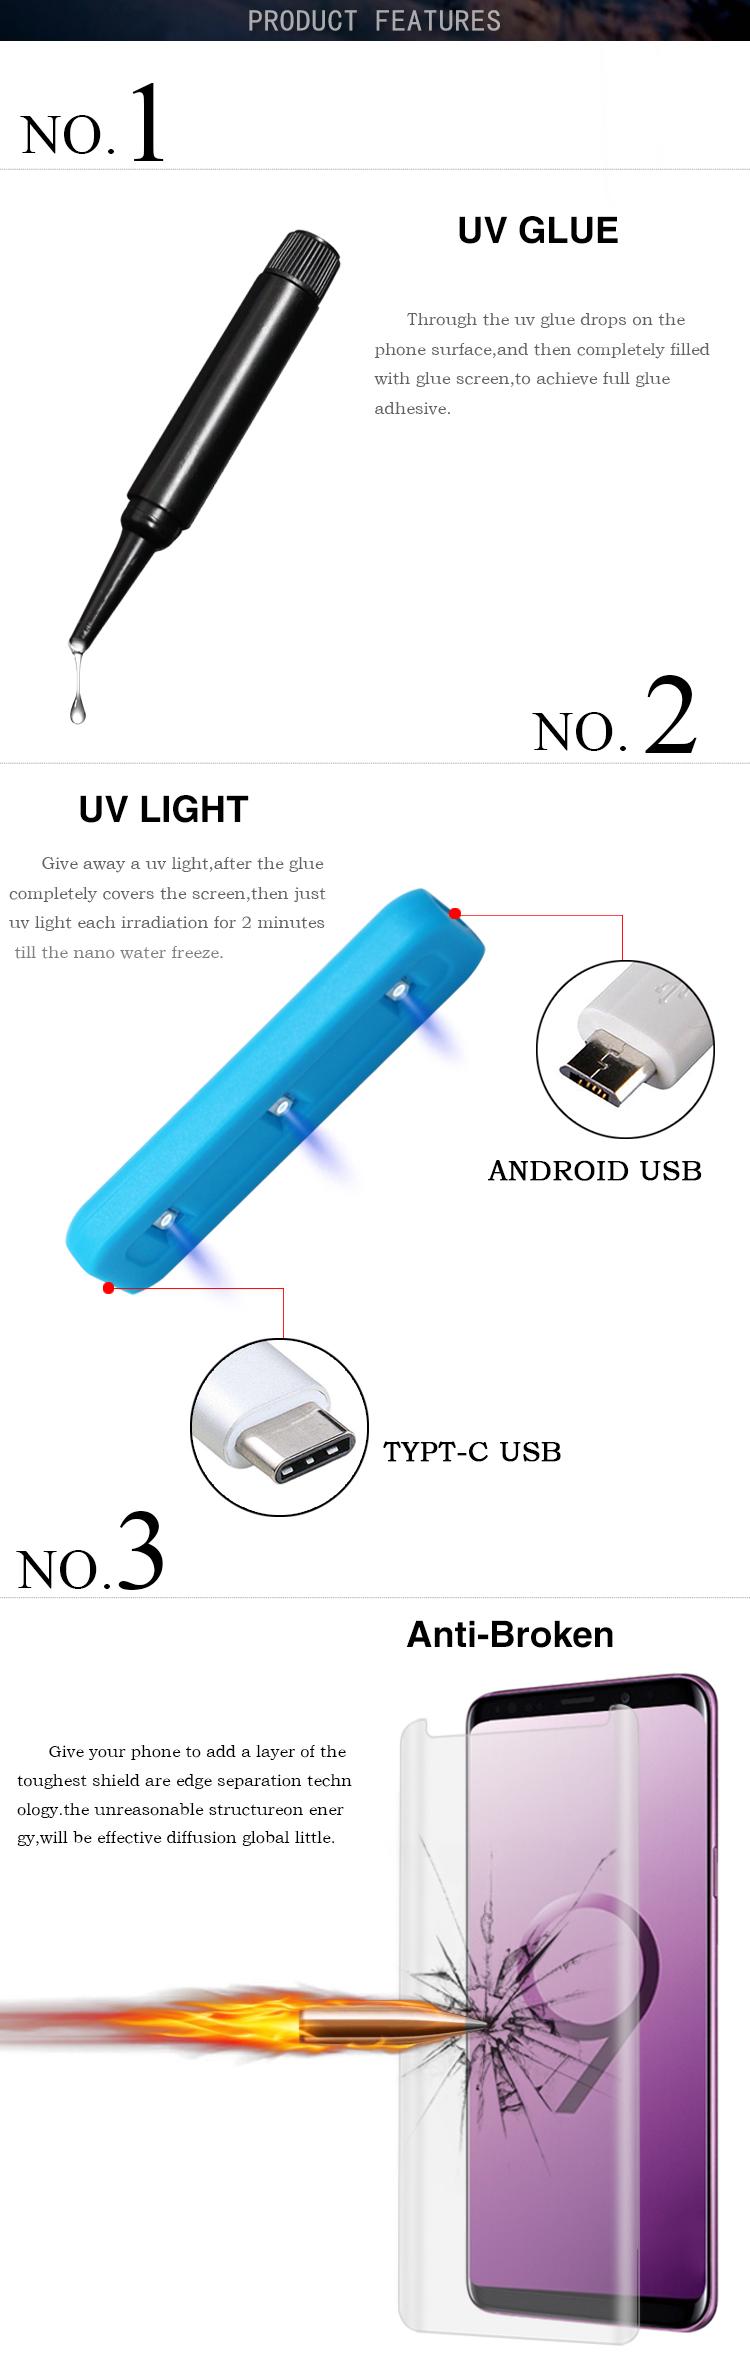 3D Curved Tempered Glass Nano Liquid Full Glue UV Glue Screen Protector For  Samsung Galaxy S9 S9 Plus, View UV Glue Screen Protector, Chimaco Product